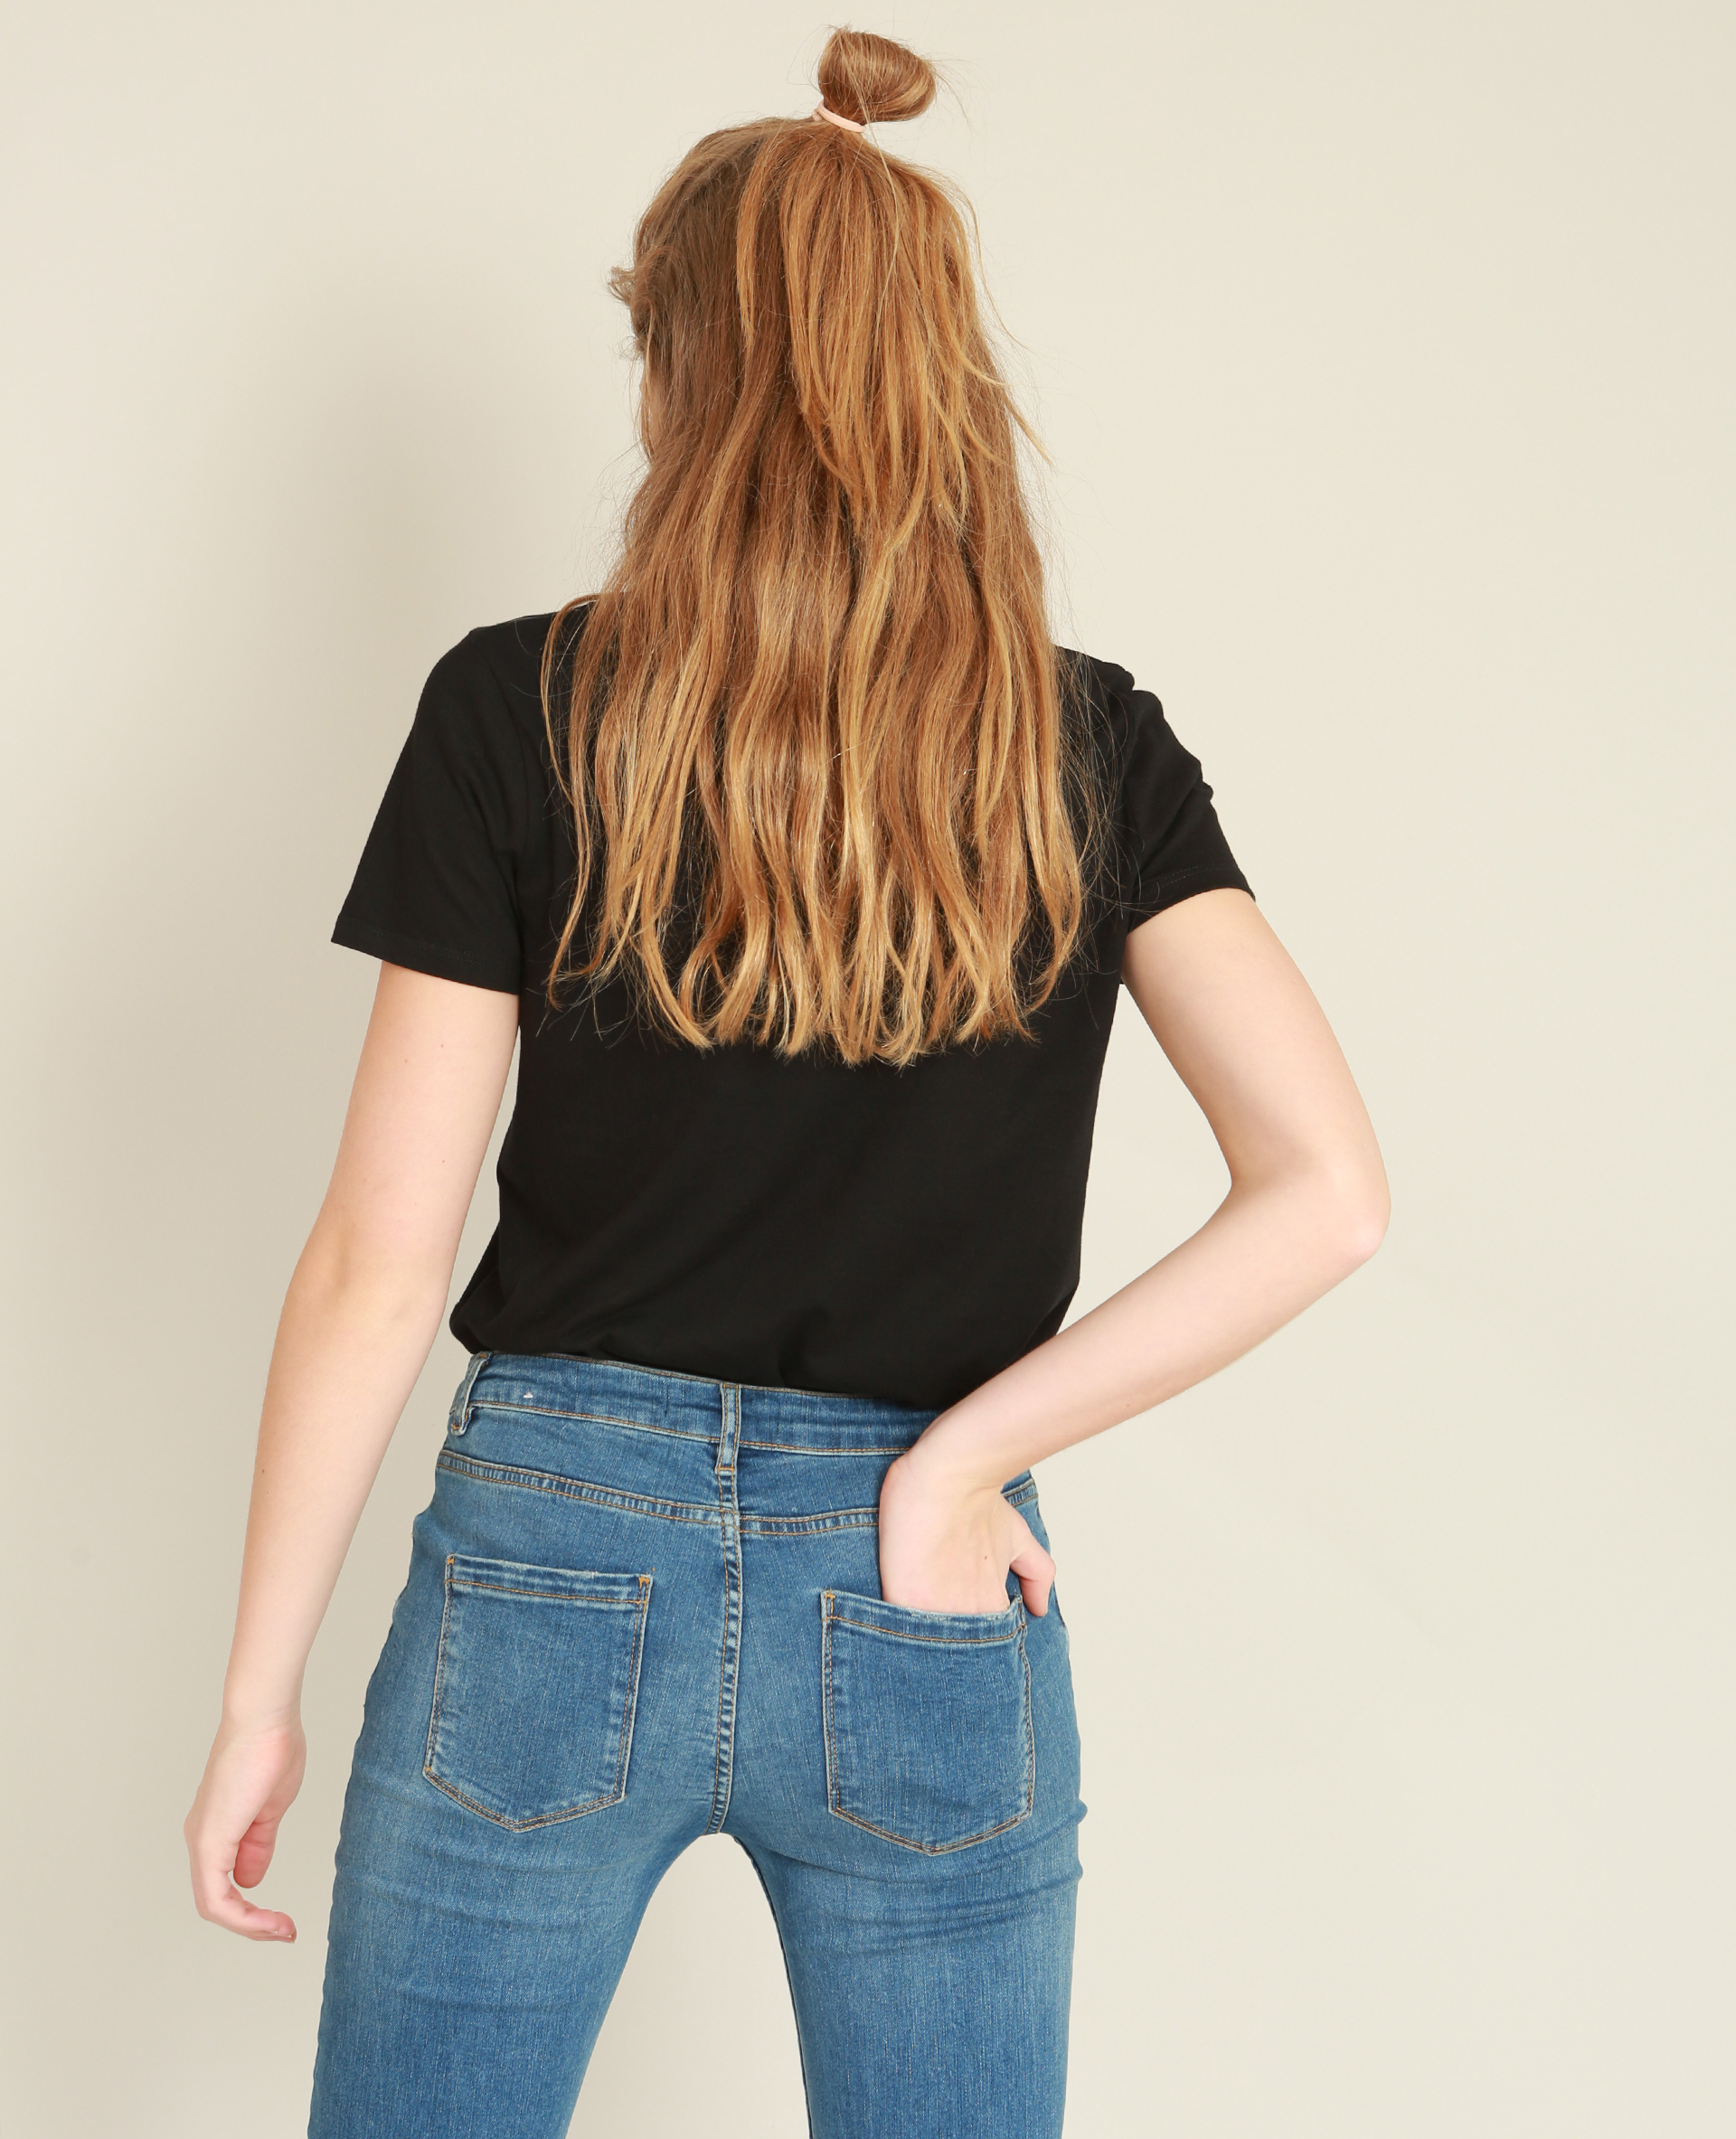 T-shirt brodé noir - Pimkie